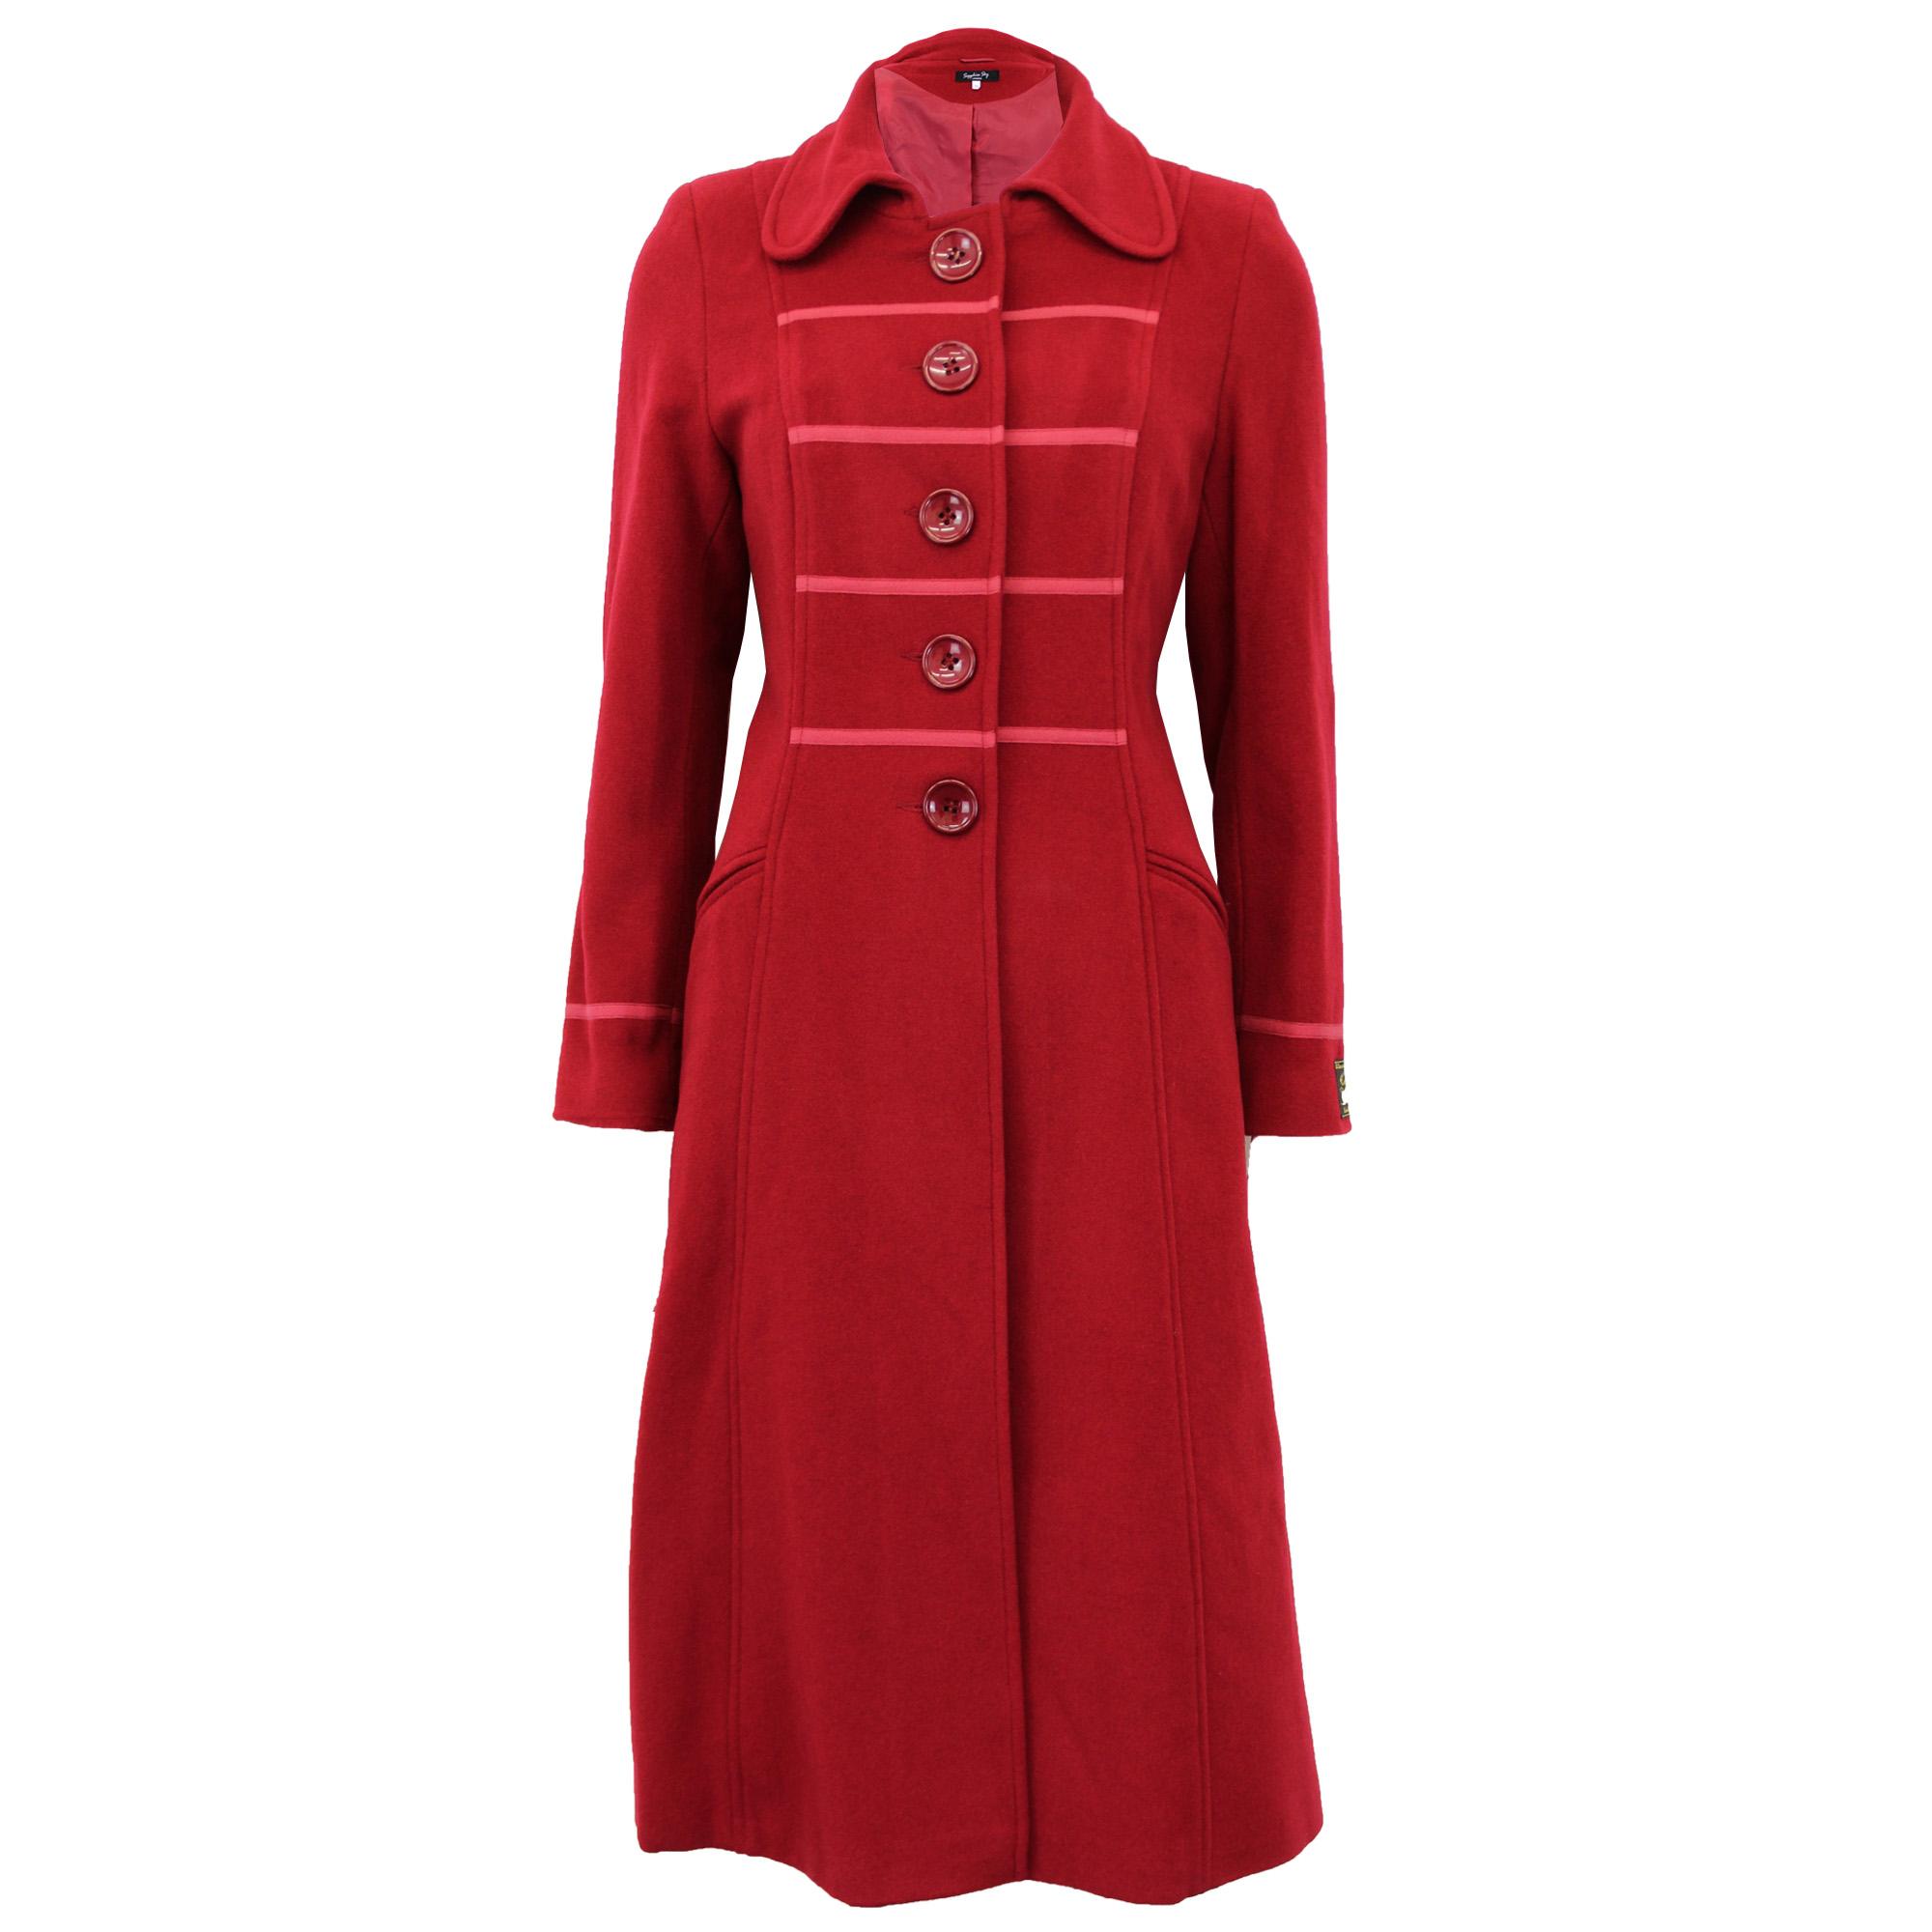 big sale dccc9 060e4 Details zu Damen Wolle Kaschmir Mantel Jacke Oberbekleidung Trenchcoat  Winter Warm